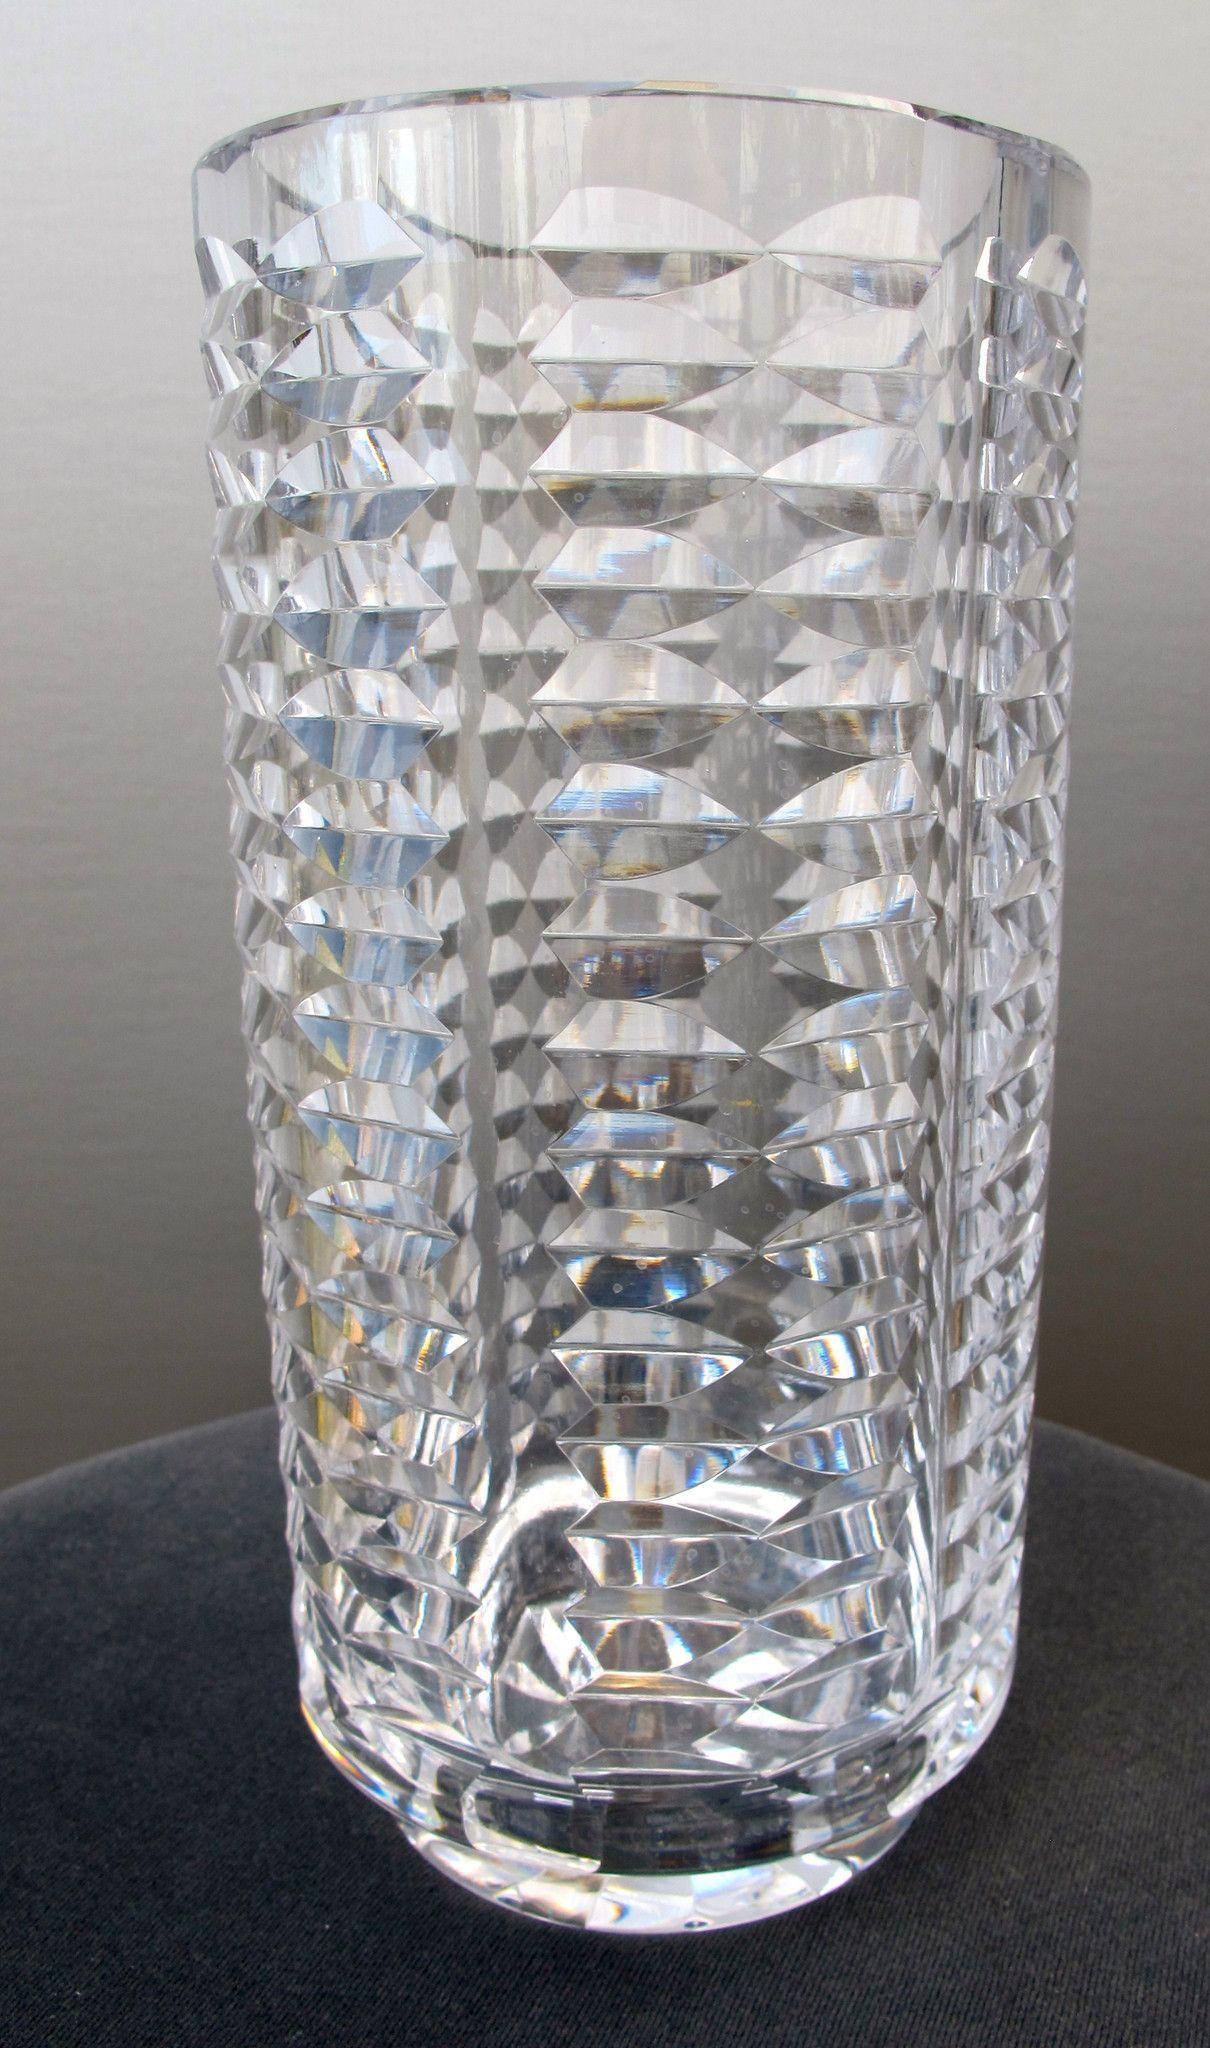 Signed waterford hand cut glass 10 vase irish crystal cut glass signed waterford hand cut glass 10 vase irish crystal reviewsmspy